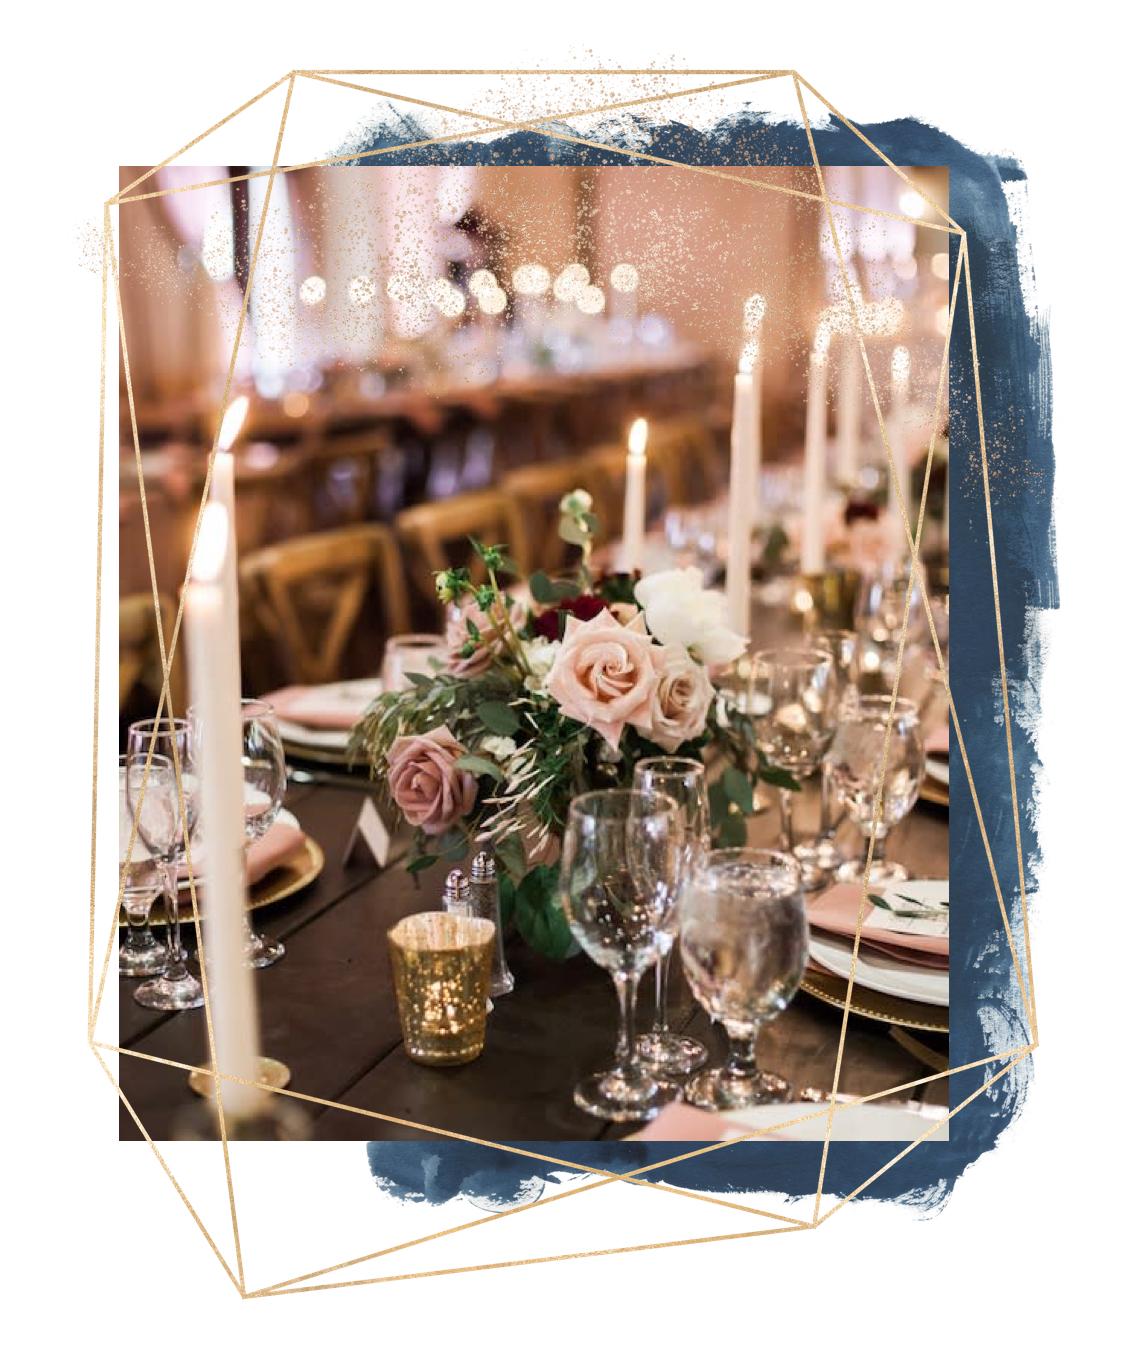 SacDecorNrentals-wedding-sacramento-event-rentals-9.jpg